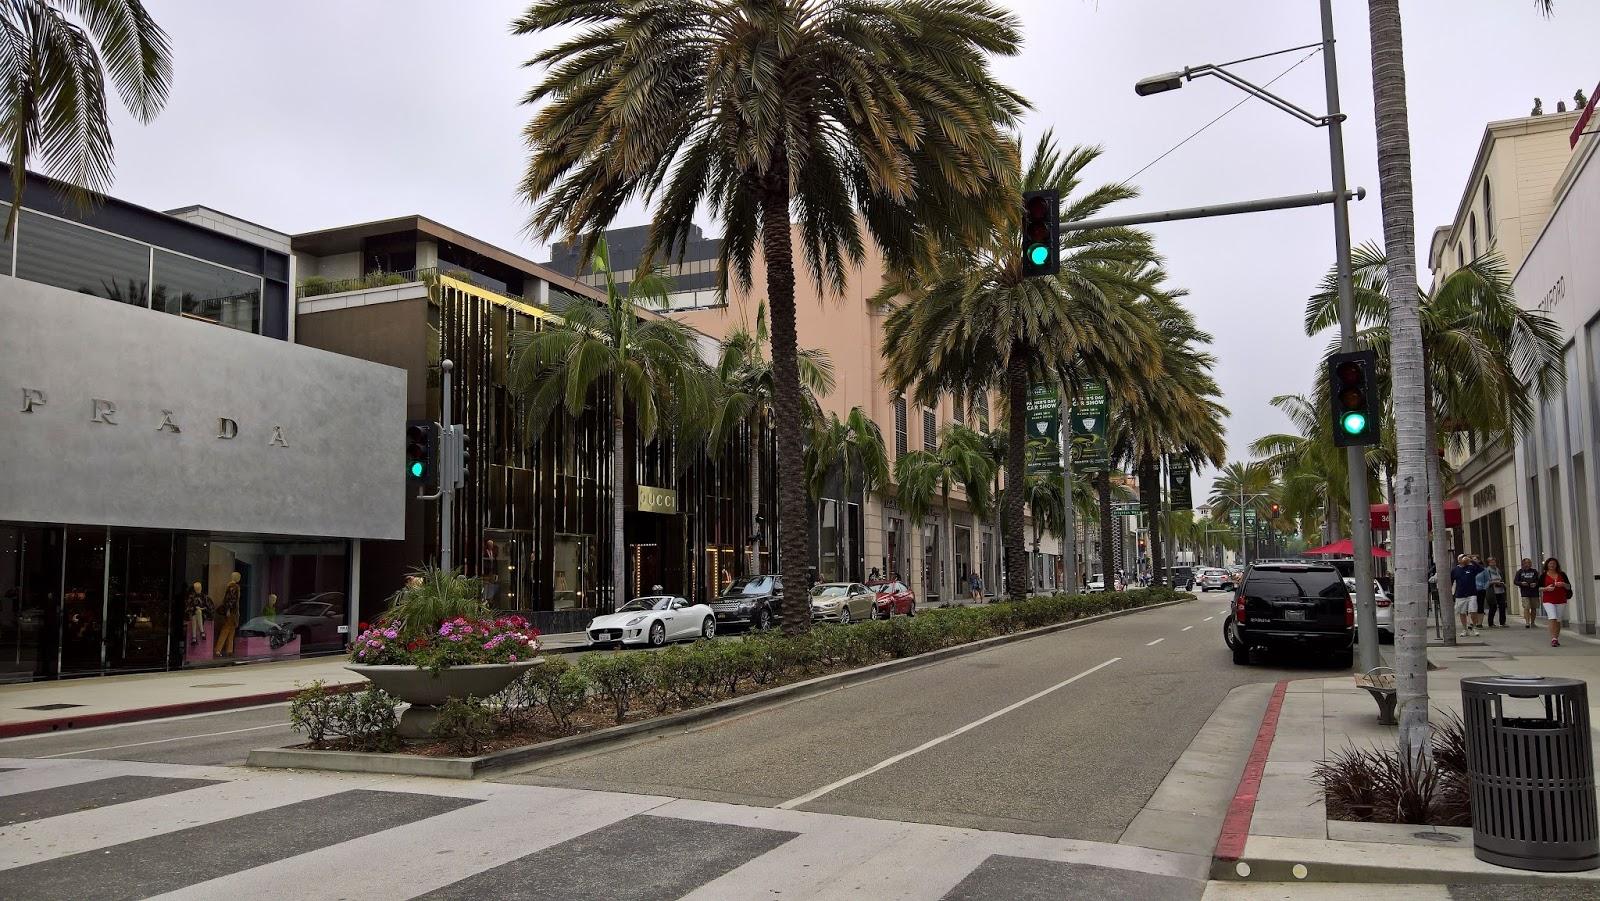 Rodeo Drive Los Angeles kiertoajelu Mallaspulla matkakertomus